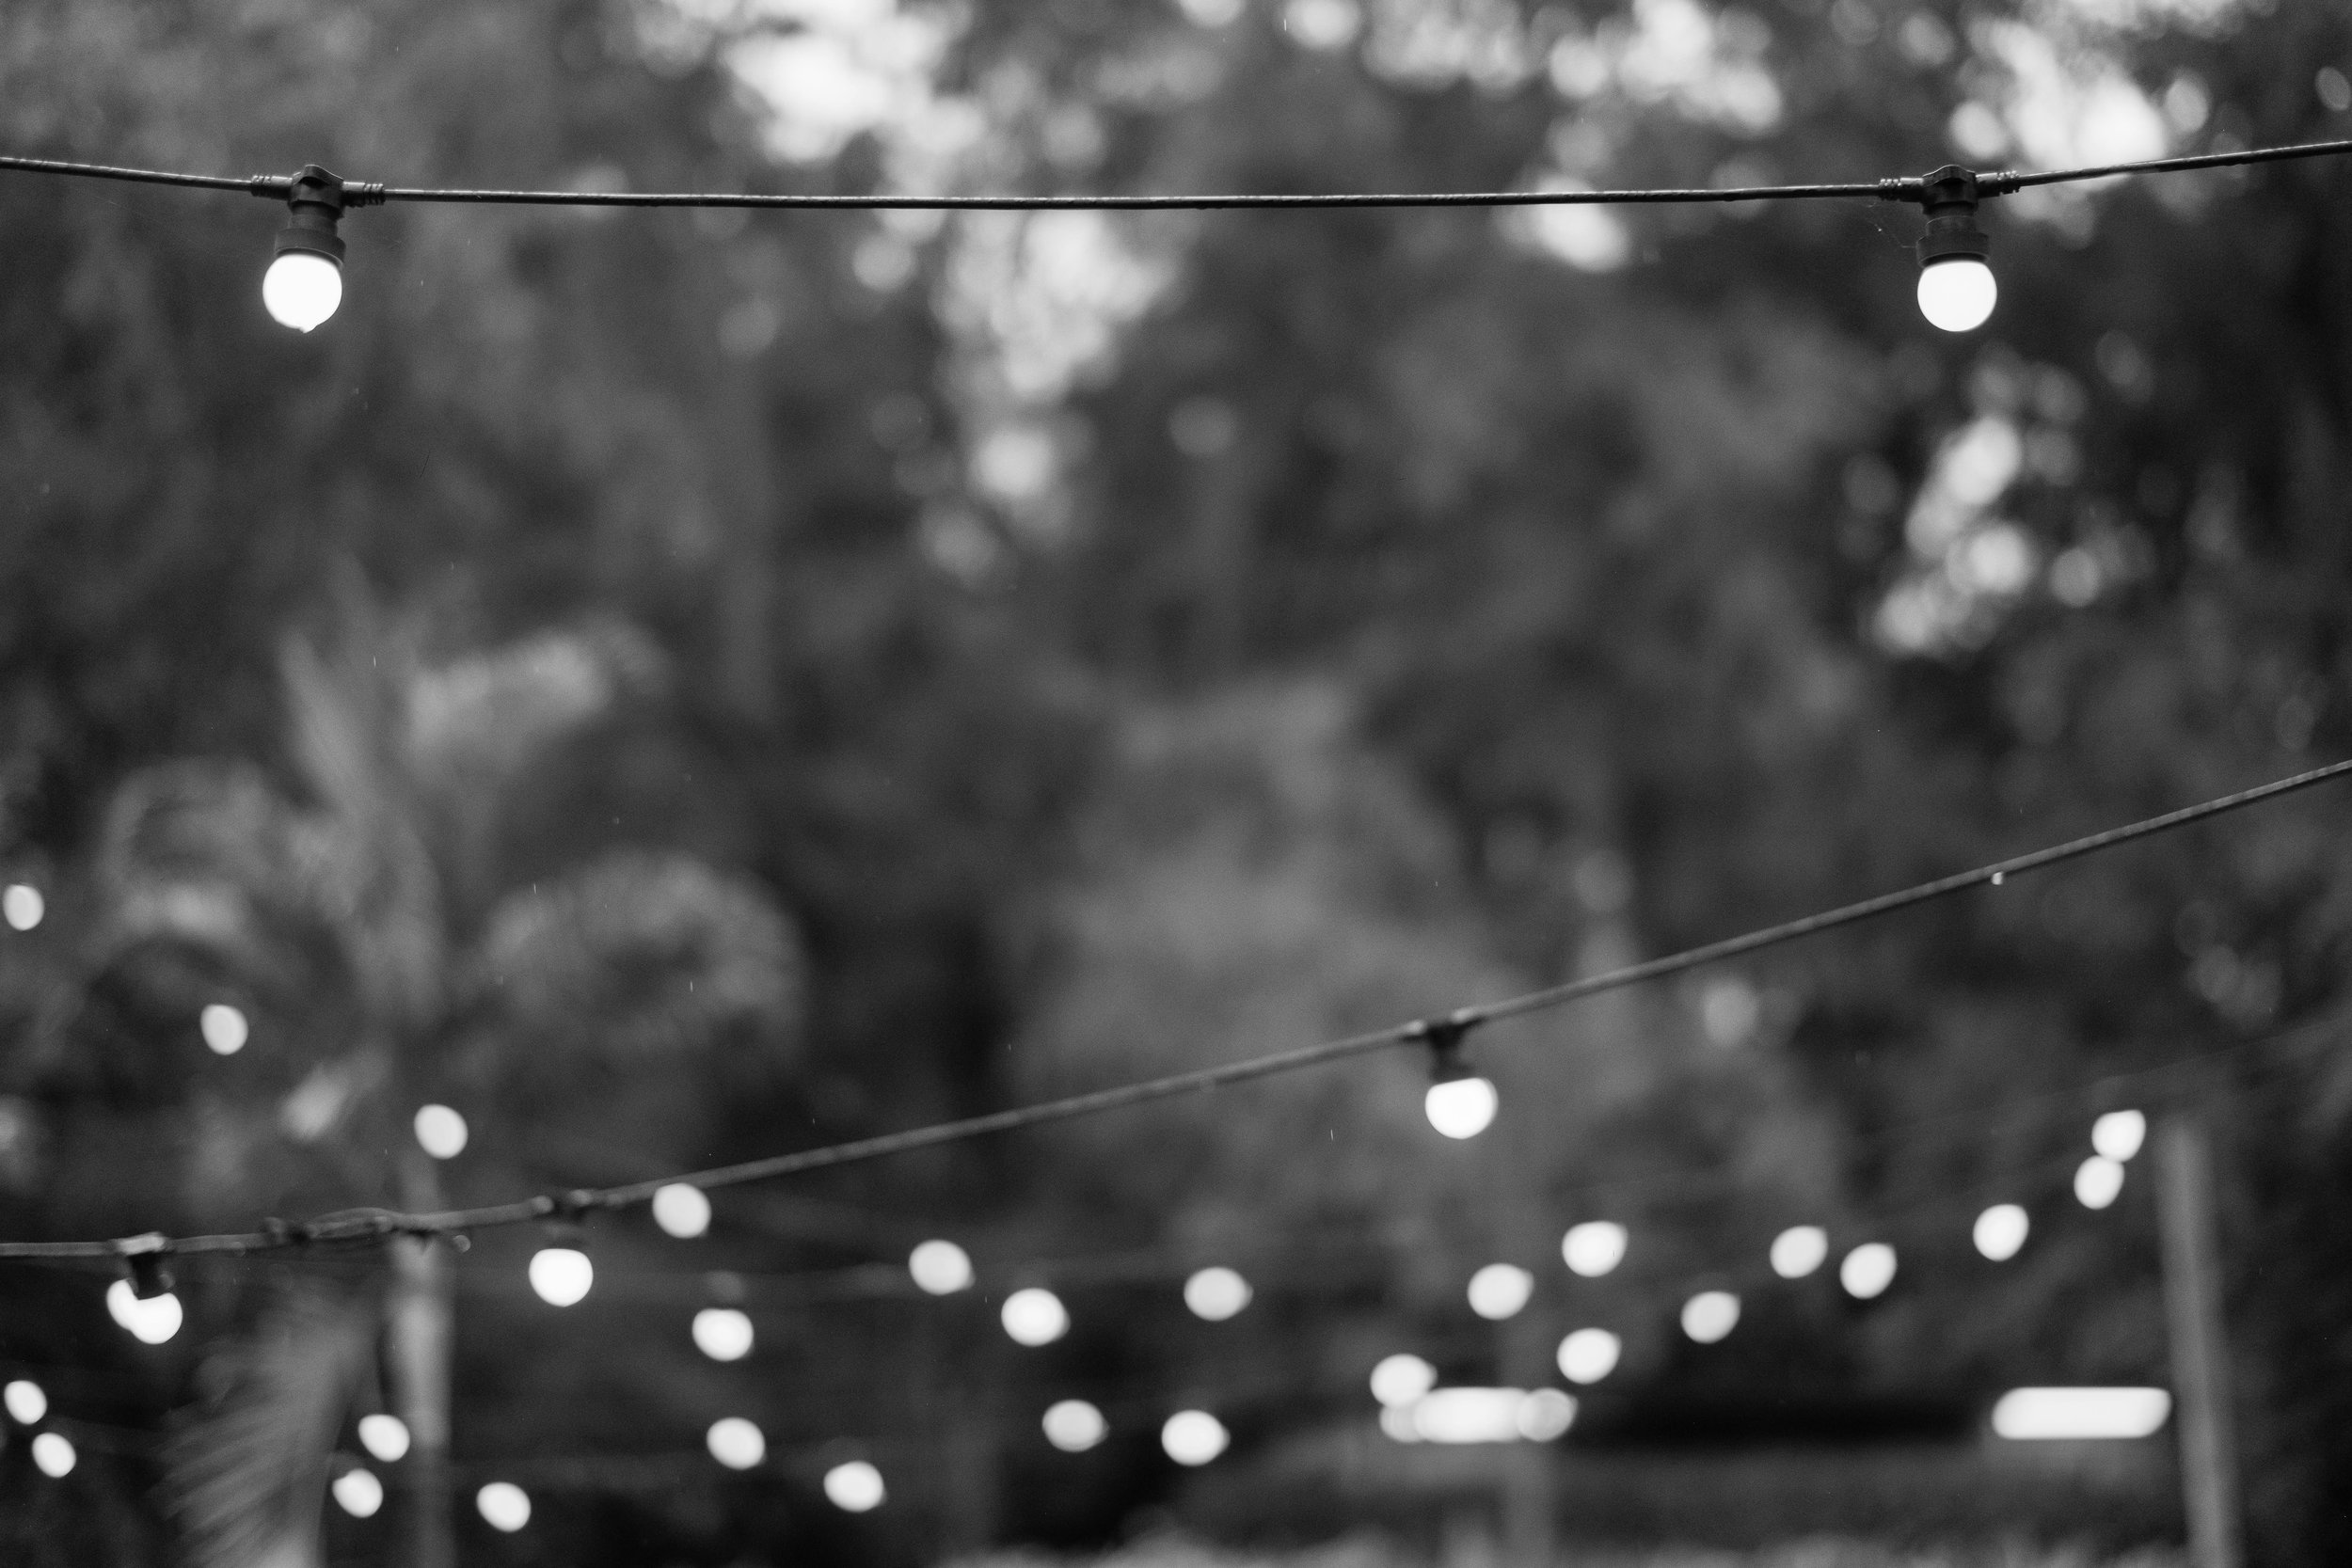 brisbane-gold-coast-sunshine-coast-romantic-wedding-photographer-65.jpg